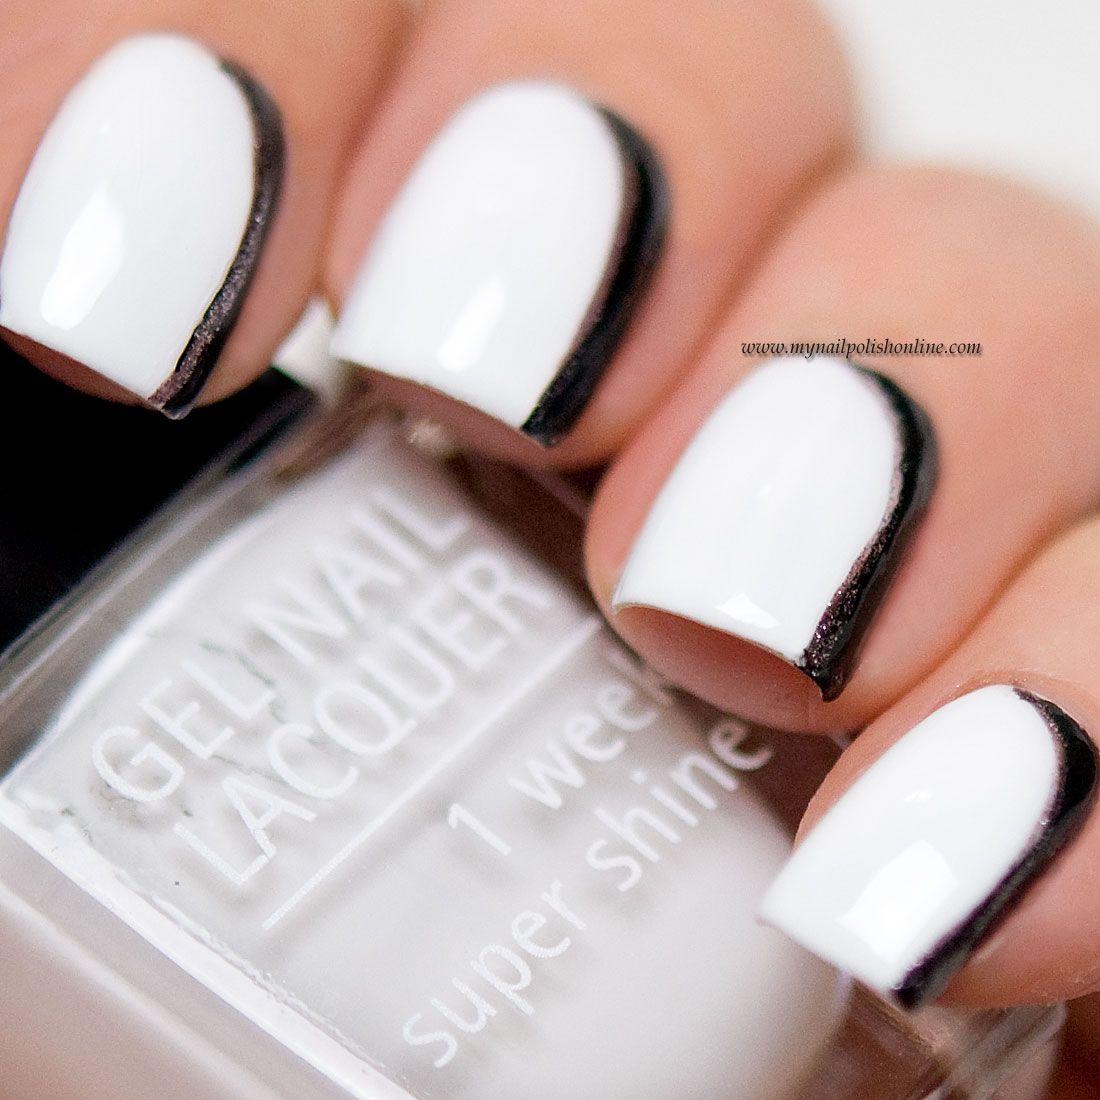 31DC2015 - Day7 B&W Nails | ¤Nails I Love¤ | Pinterest | Nail polish ...